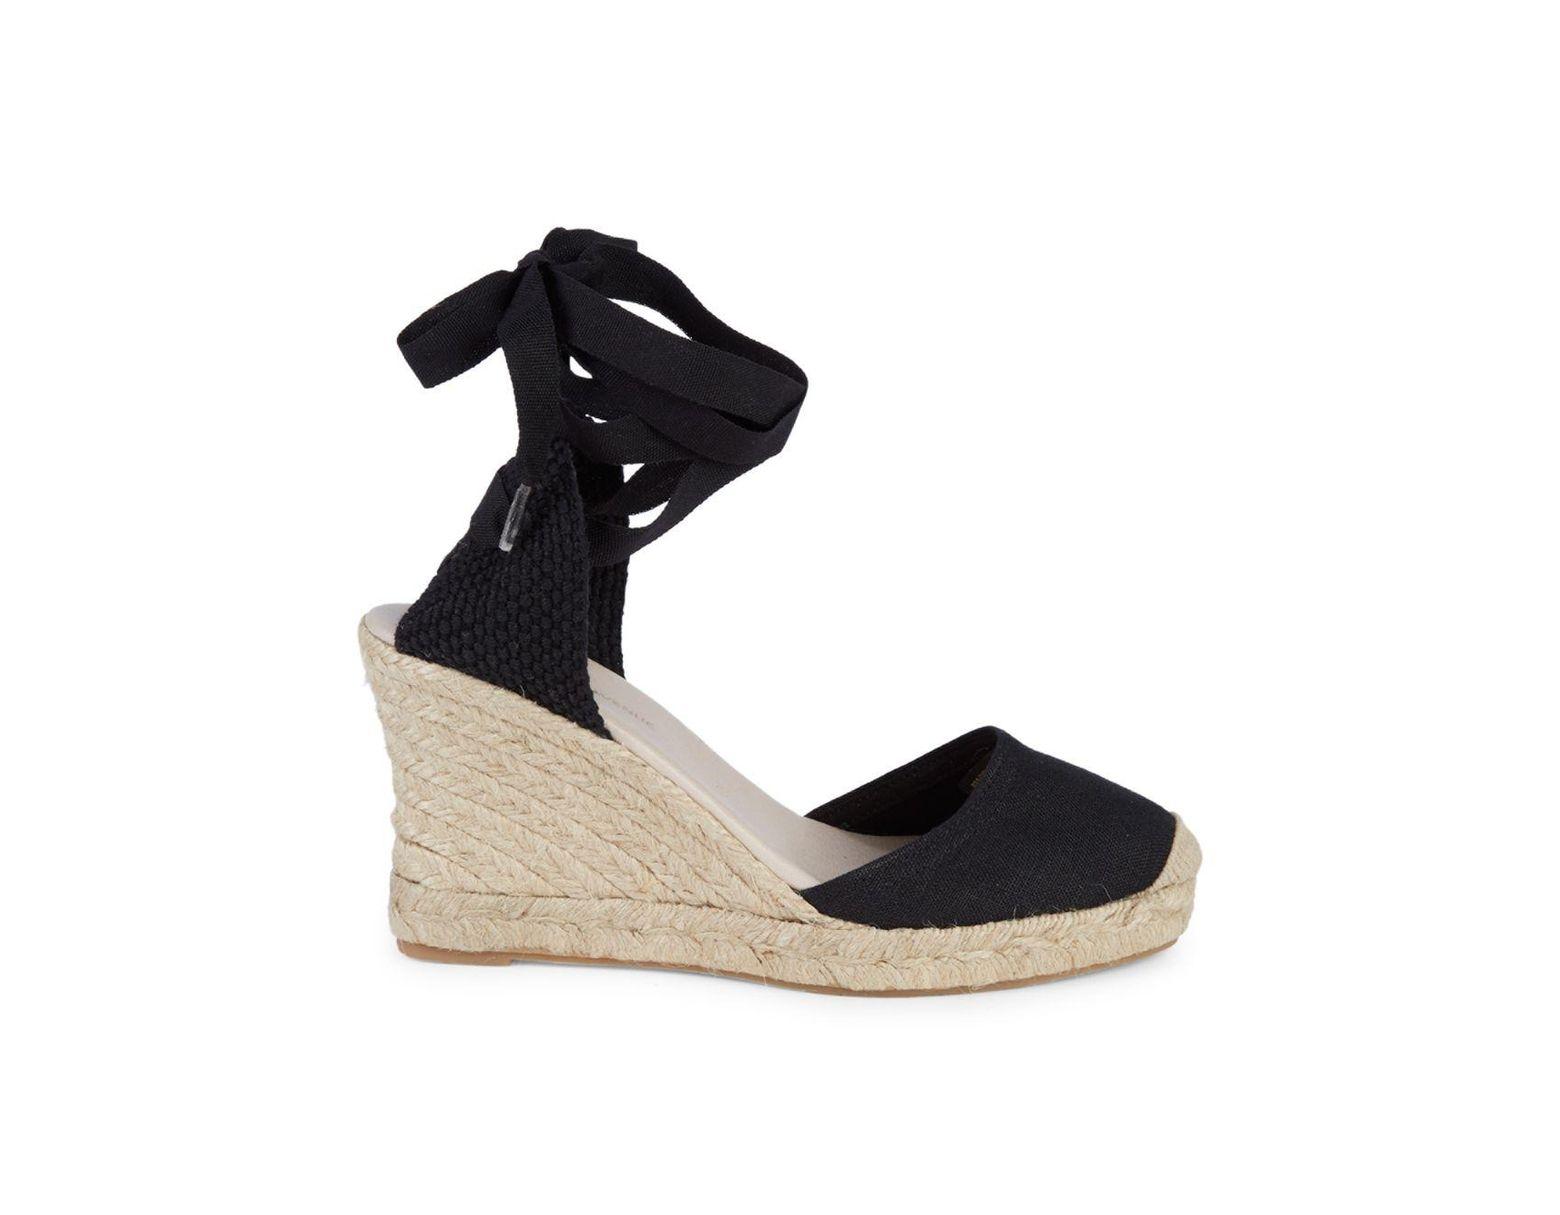 47bf86a1df2 Women's Black Polina Espadrille Wedge Sandals